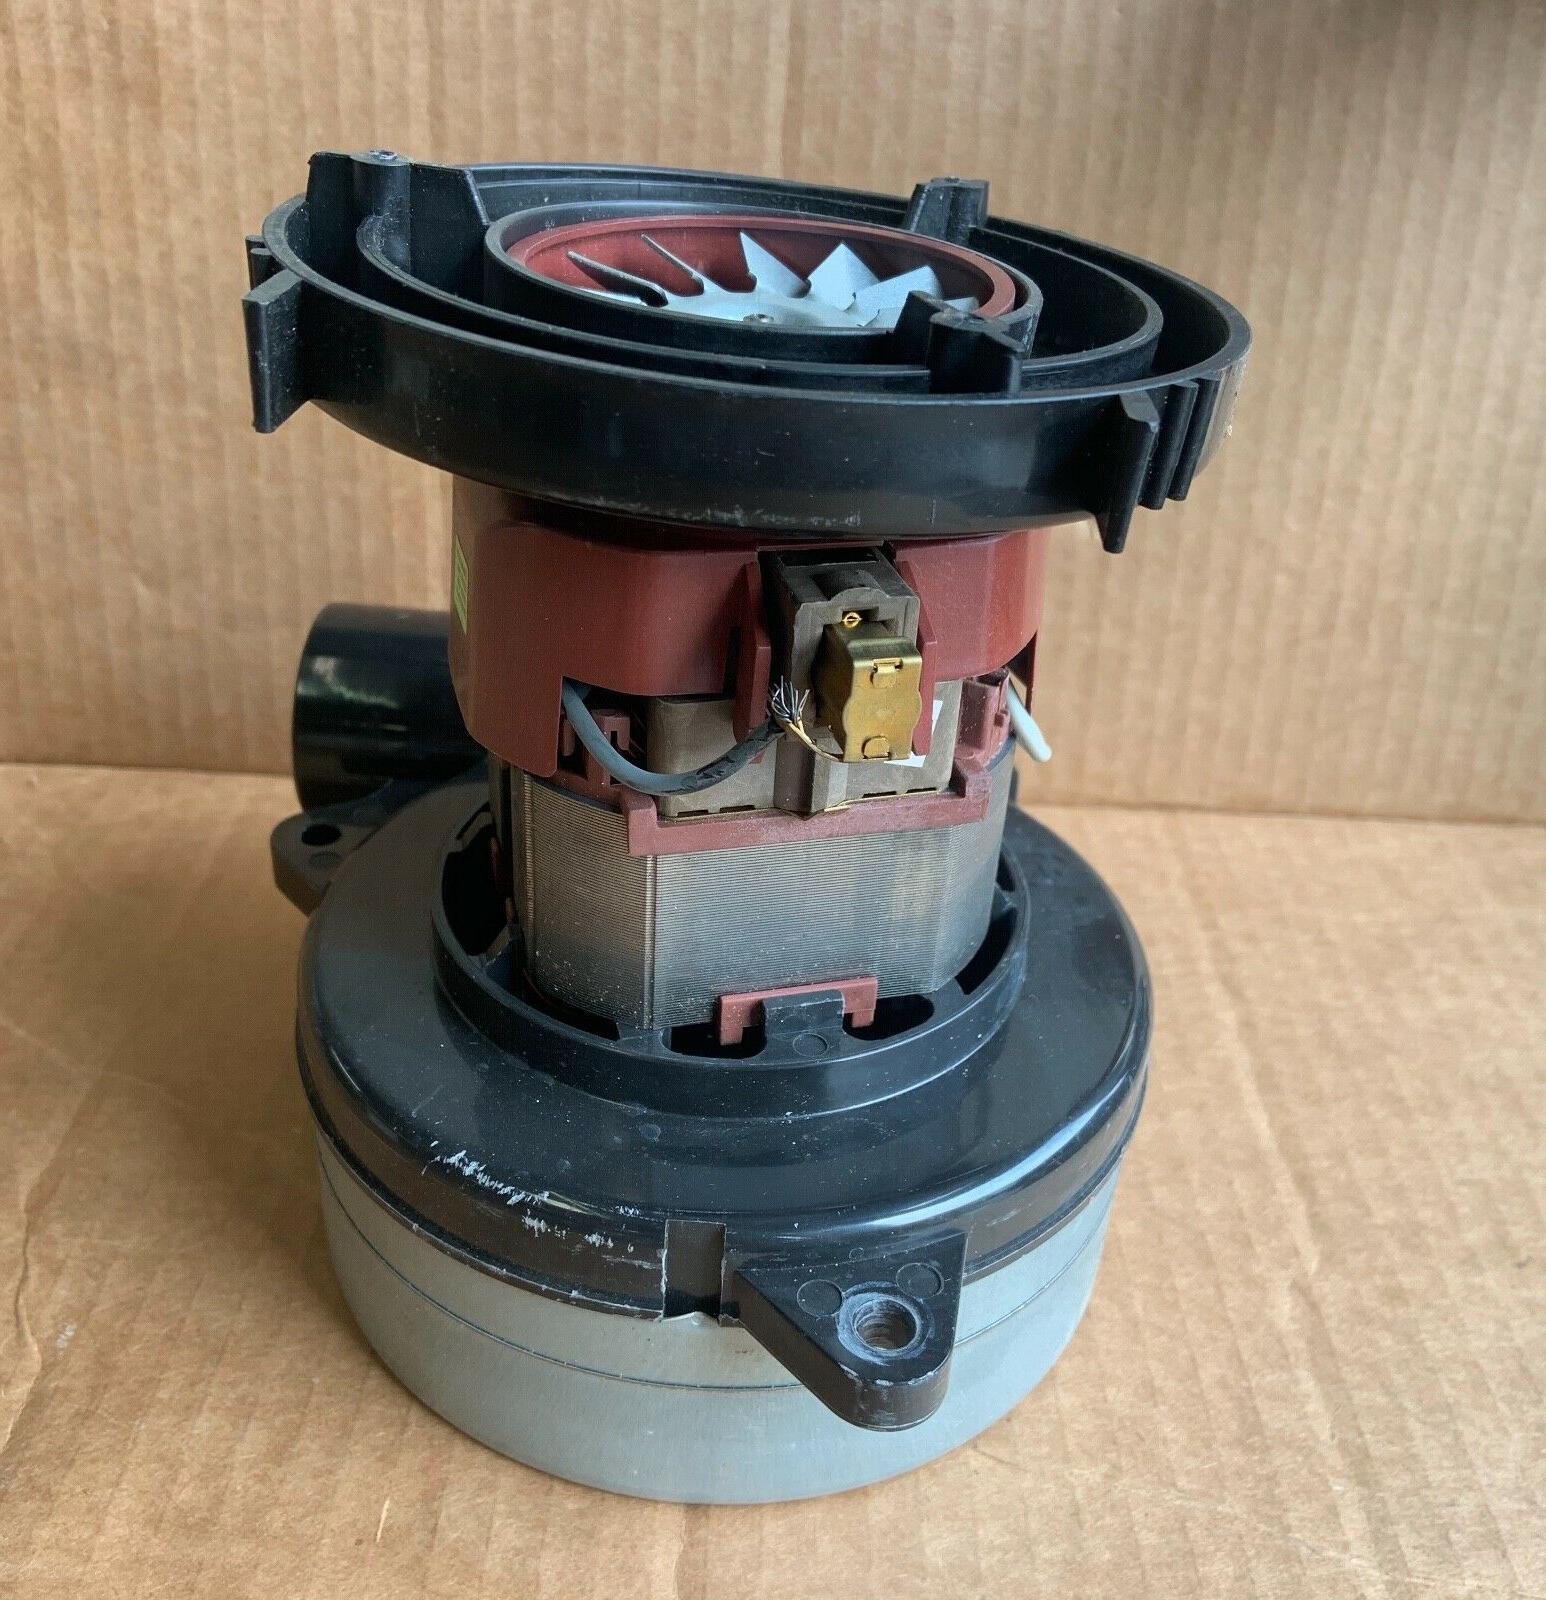 m4910 20 paint sprayer blower assembly